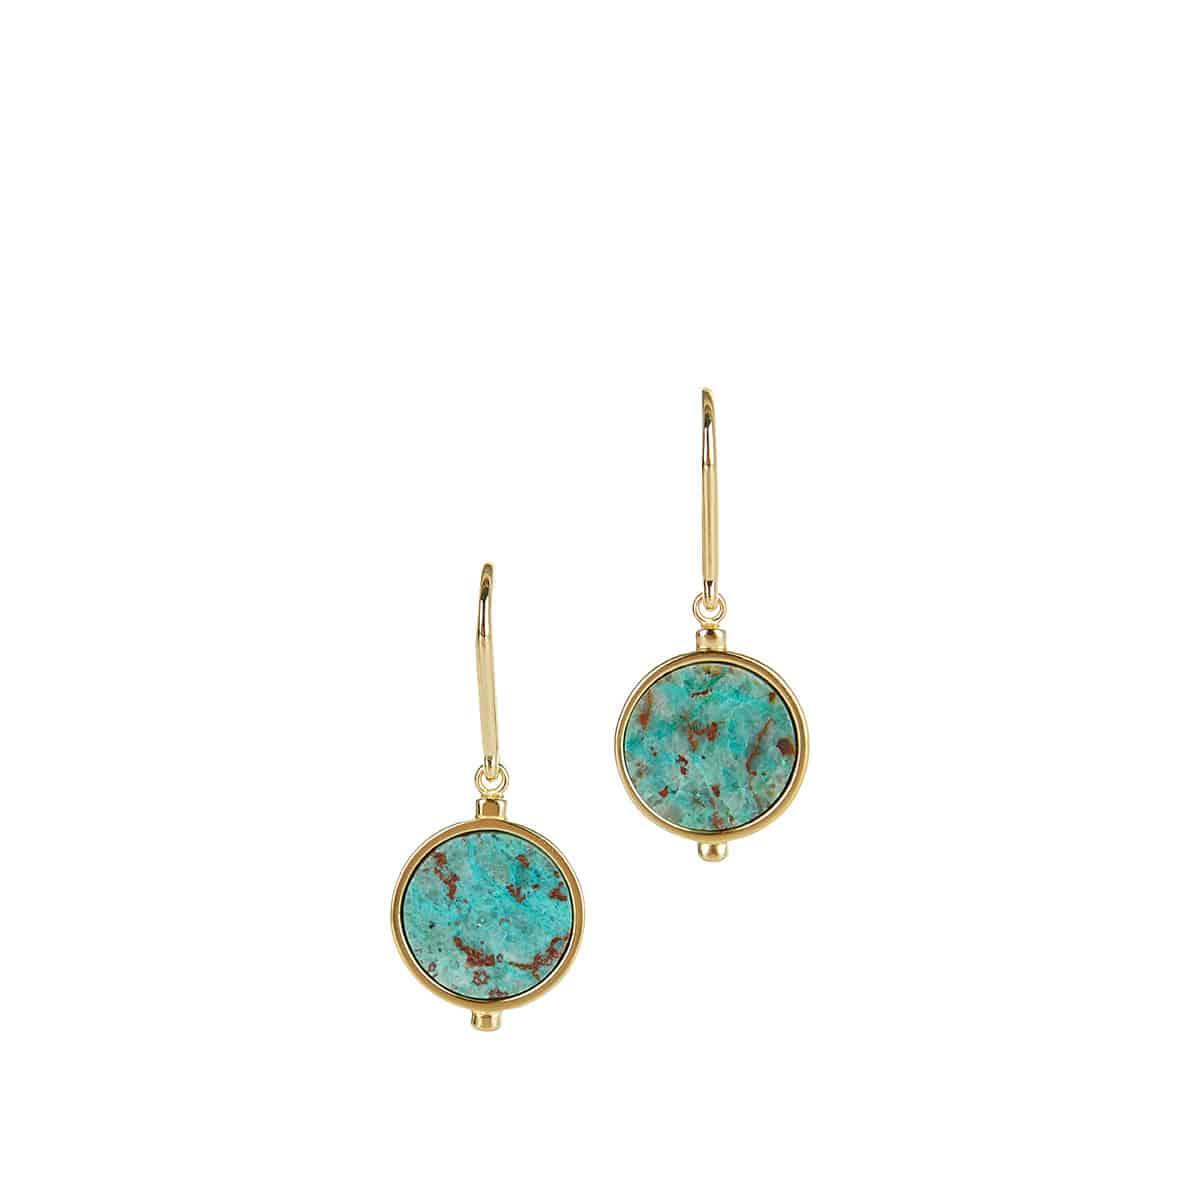 Julius stone drop earrings